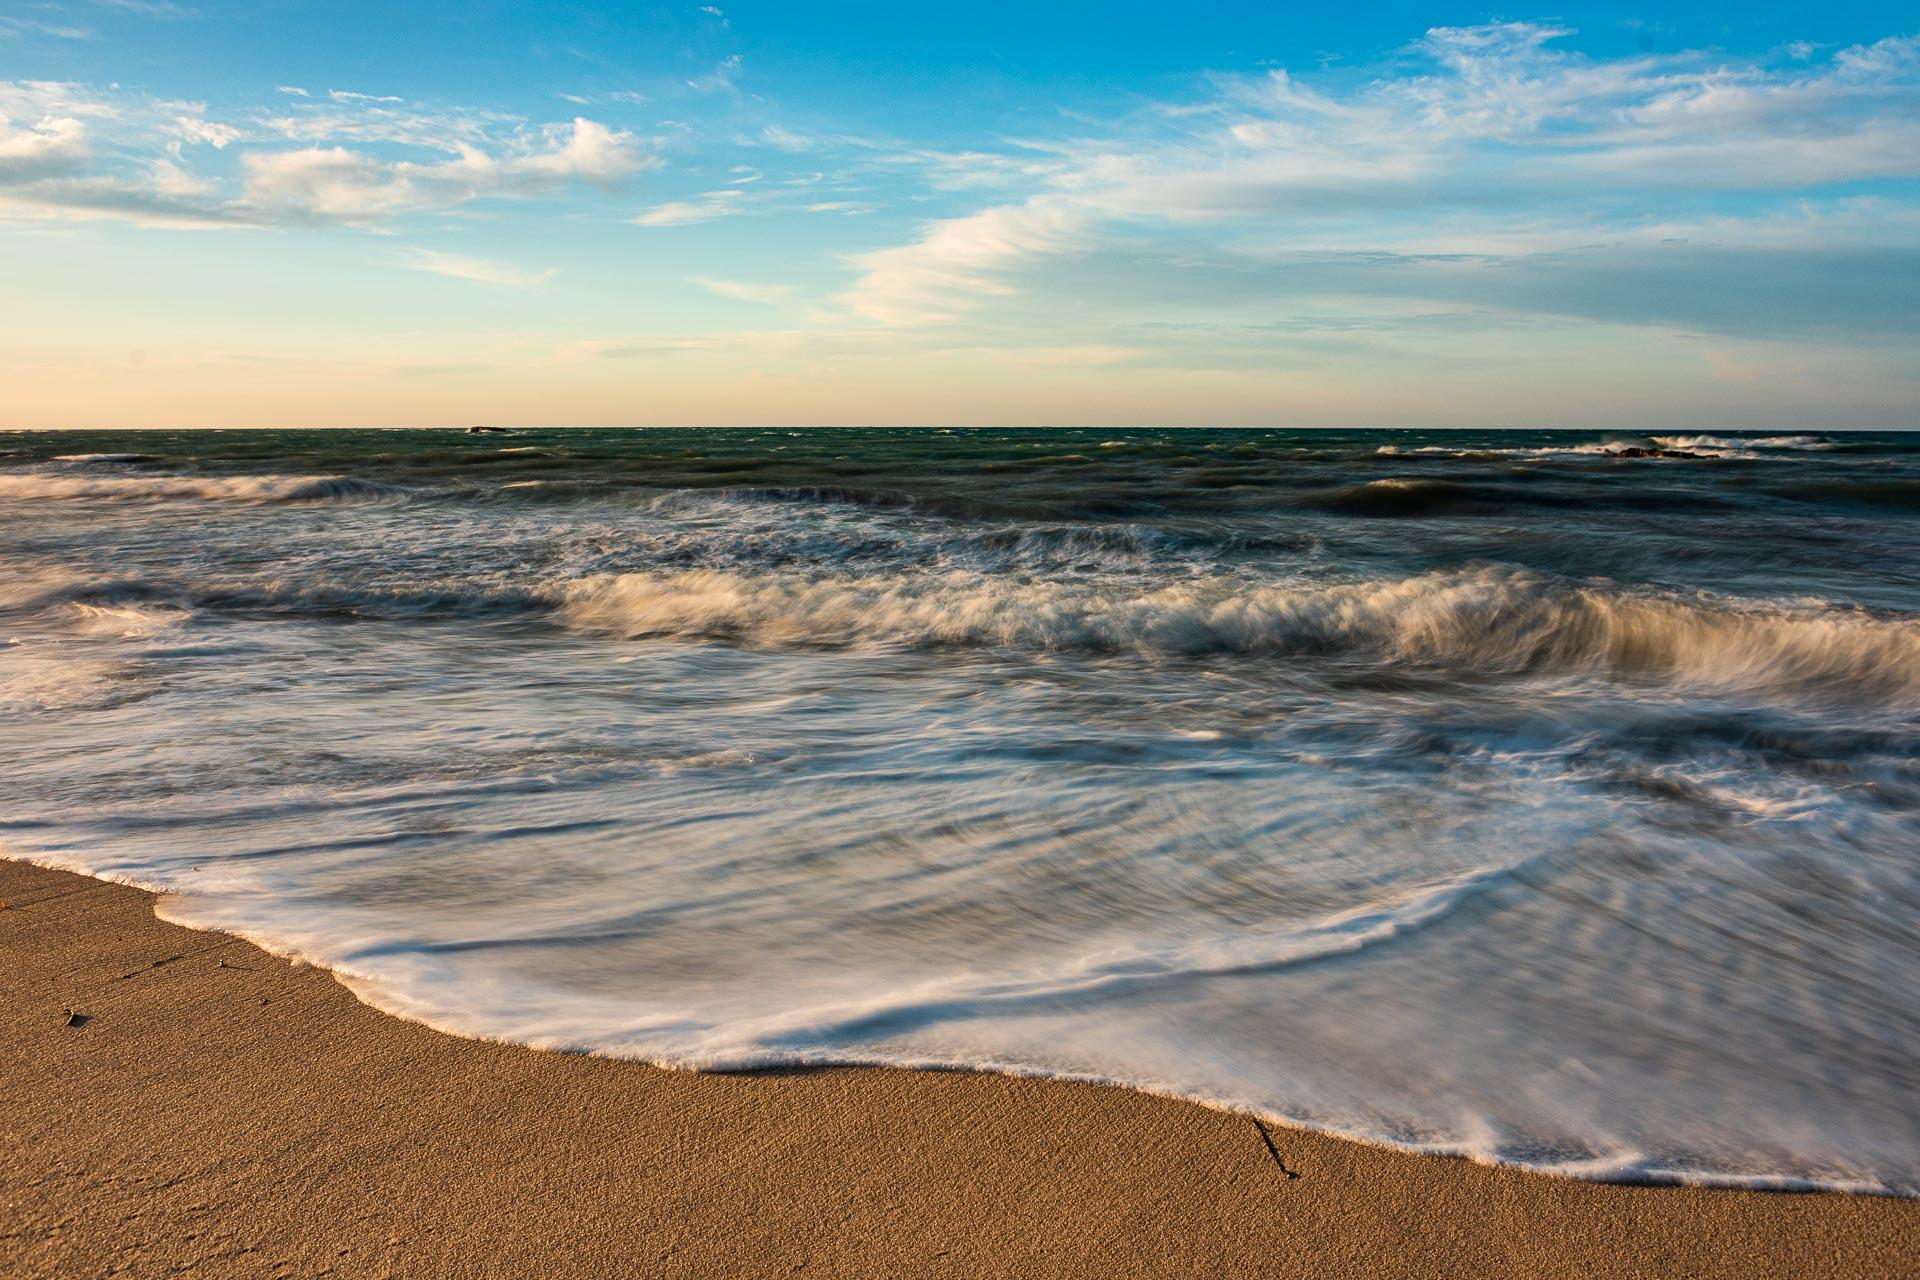 Onde come un velo di sposa, seascape long exposure photography